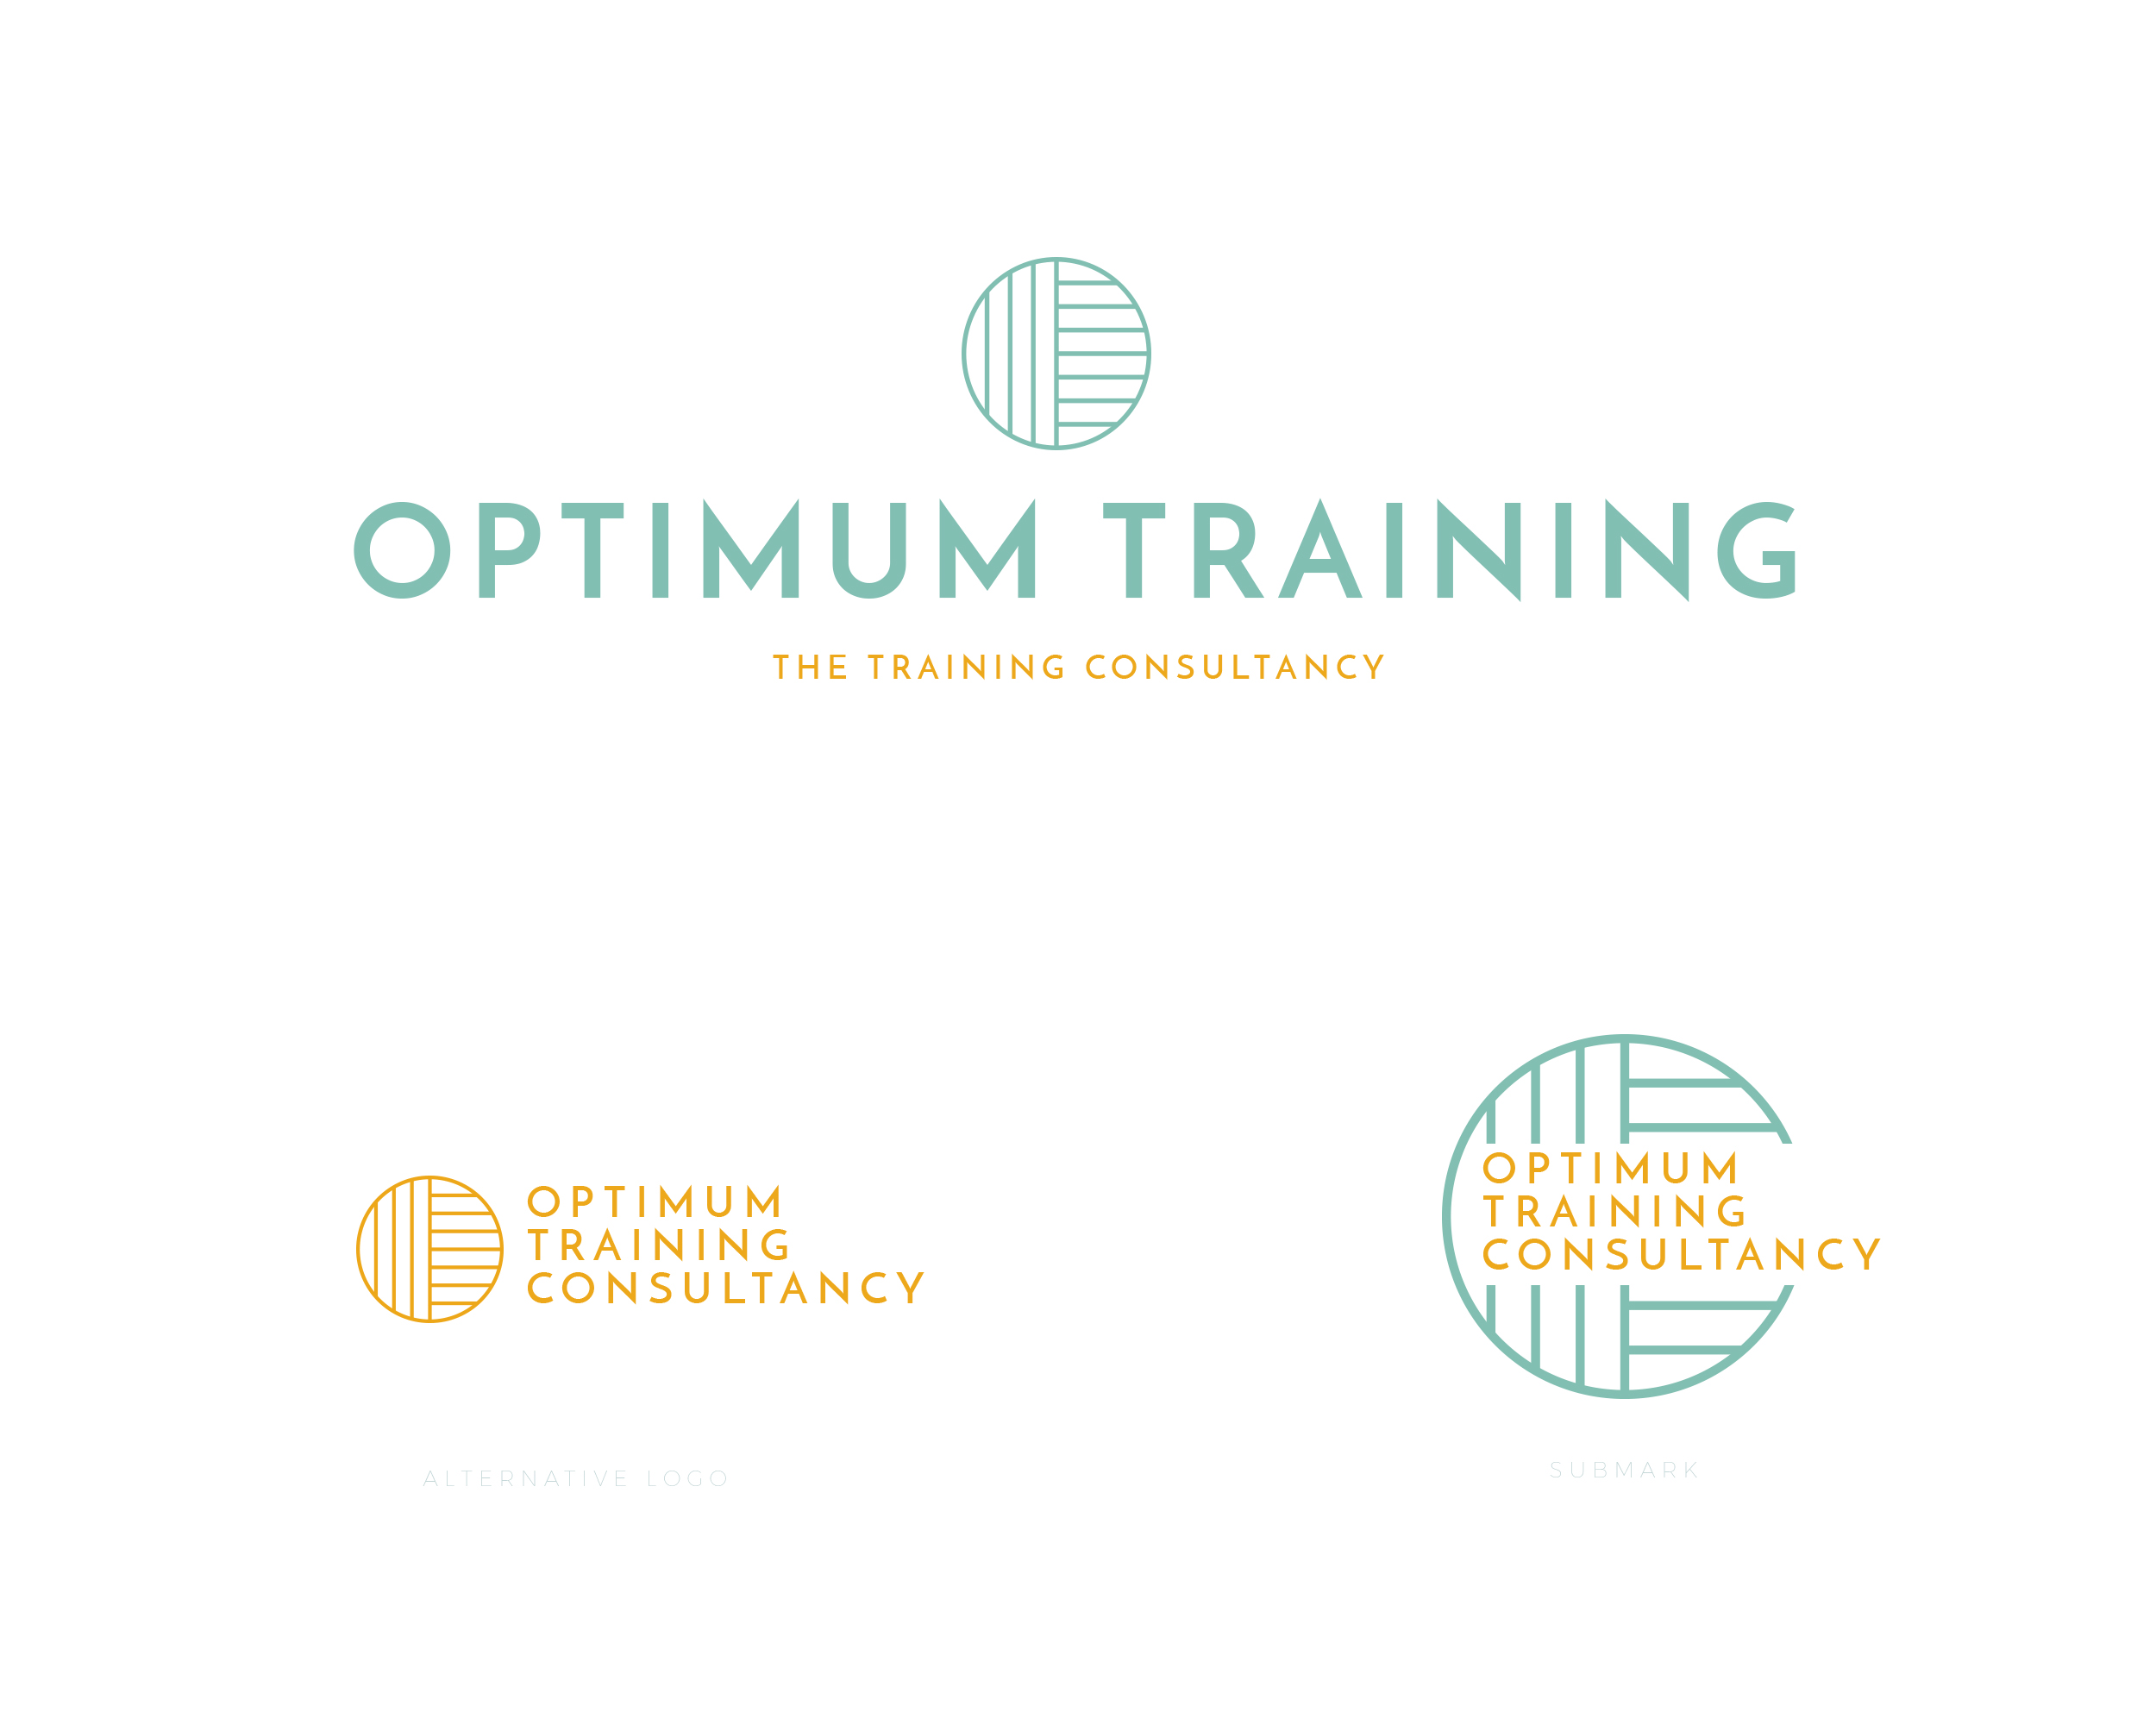 optimum training logo 1.jpg